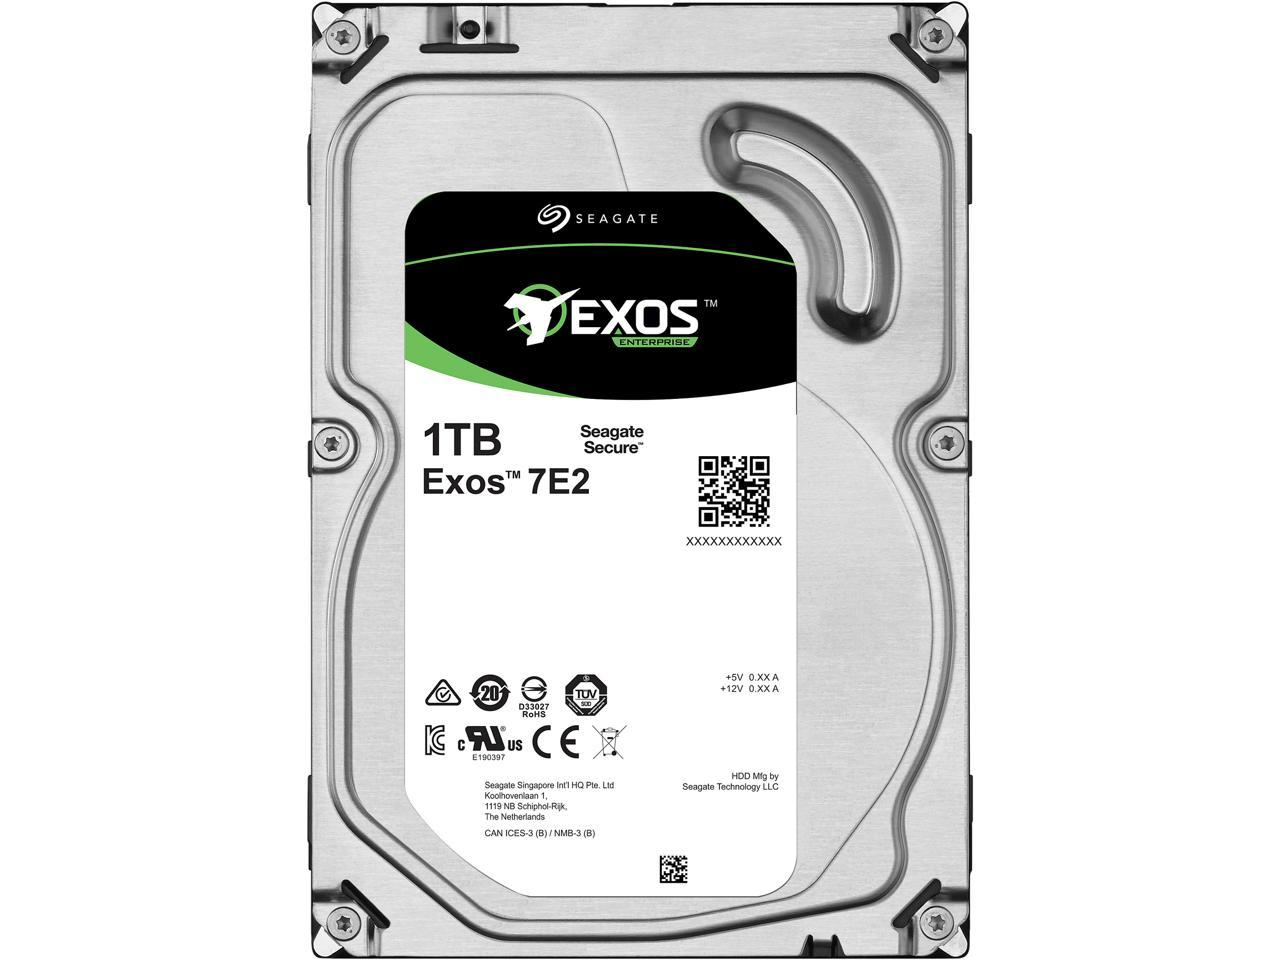 Seagate 3TB Enterprise Capacity HDD SATA 6Gb//s 128MB Cache 3.5-Inch Internal Bare Drive ST3000NM0033